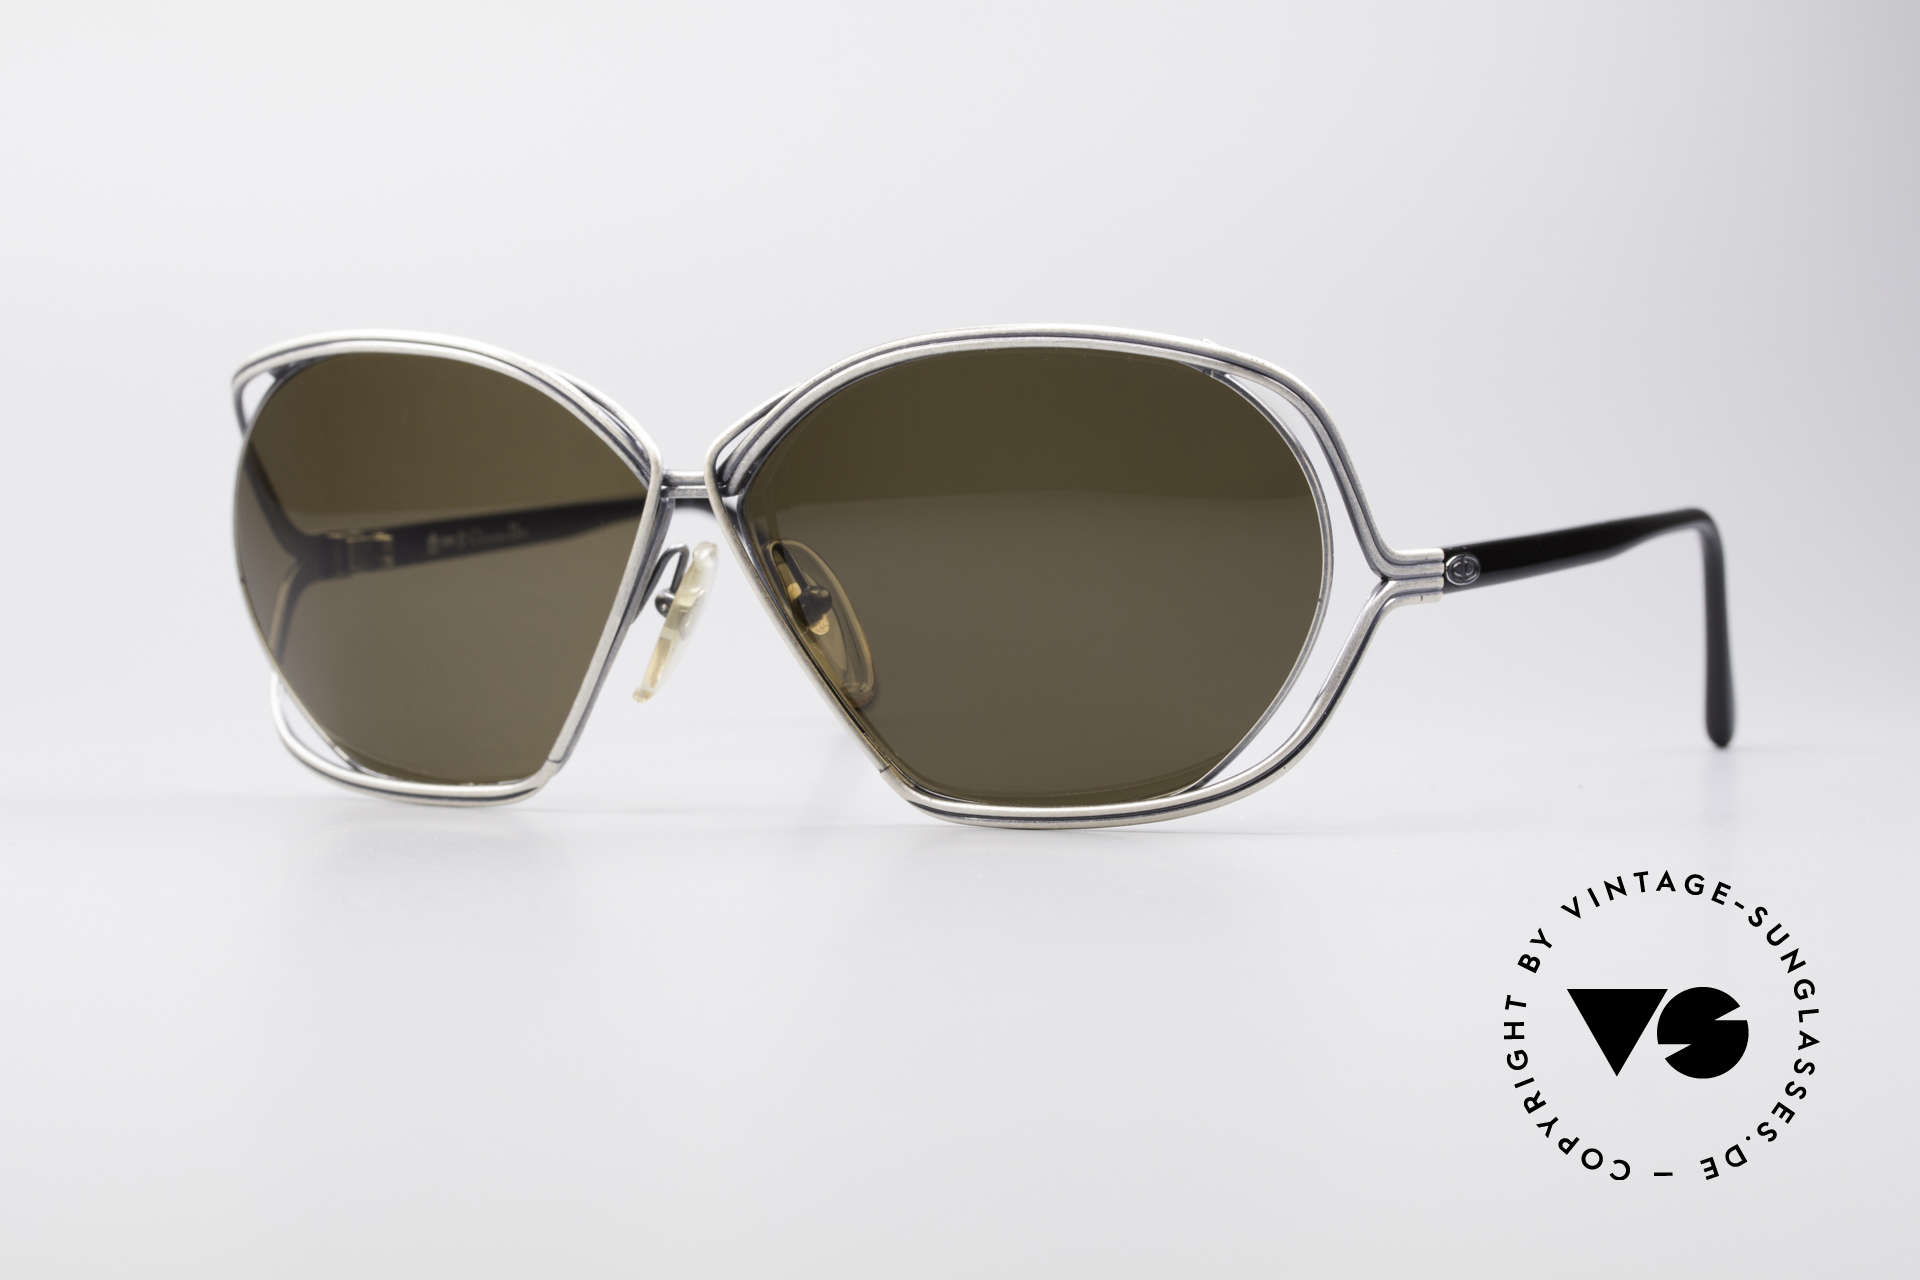 Christian Dior 2499 1980's Ladies Sunglasses, glamorous ladies' designer sunglasses of the 1980's, Made for Women